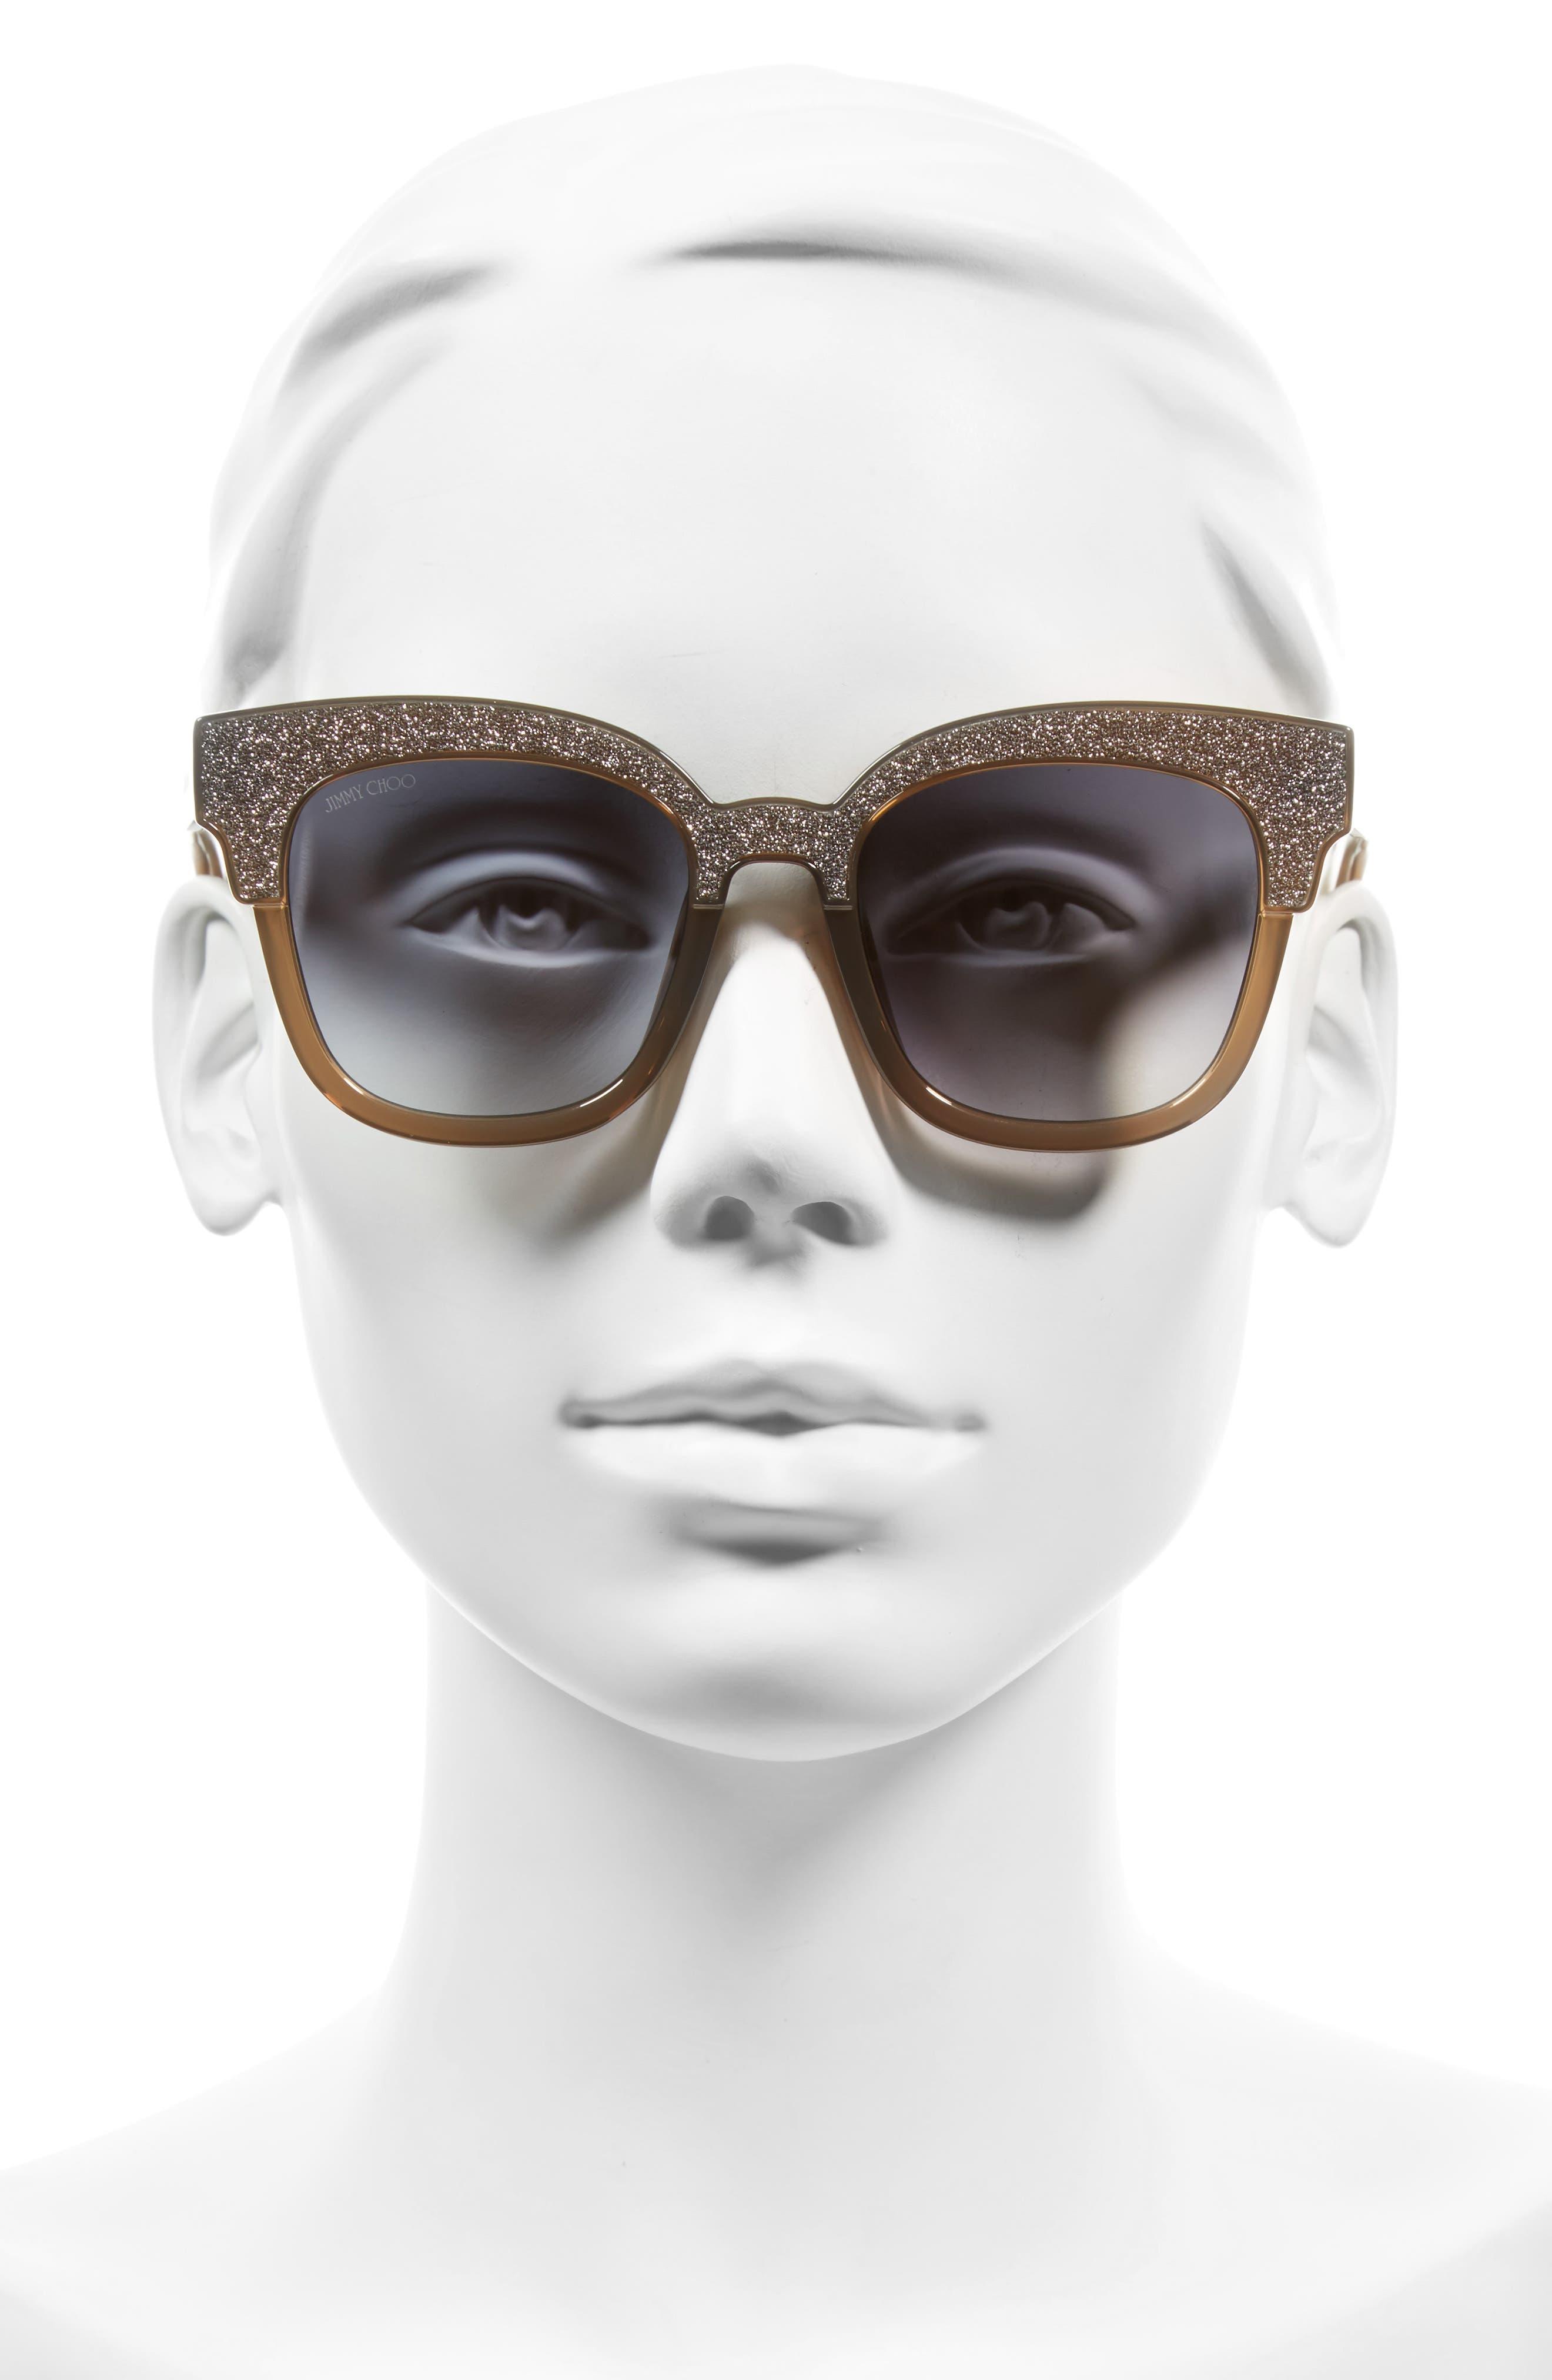 Mayelas 50mm Cat Eye Sunglasses,                             Alternate thumbnail 2, color,                             Brown/ Glitter